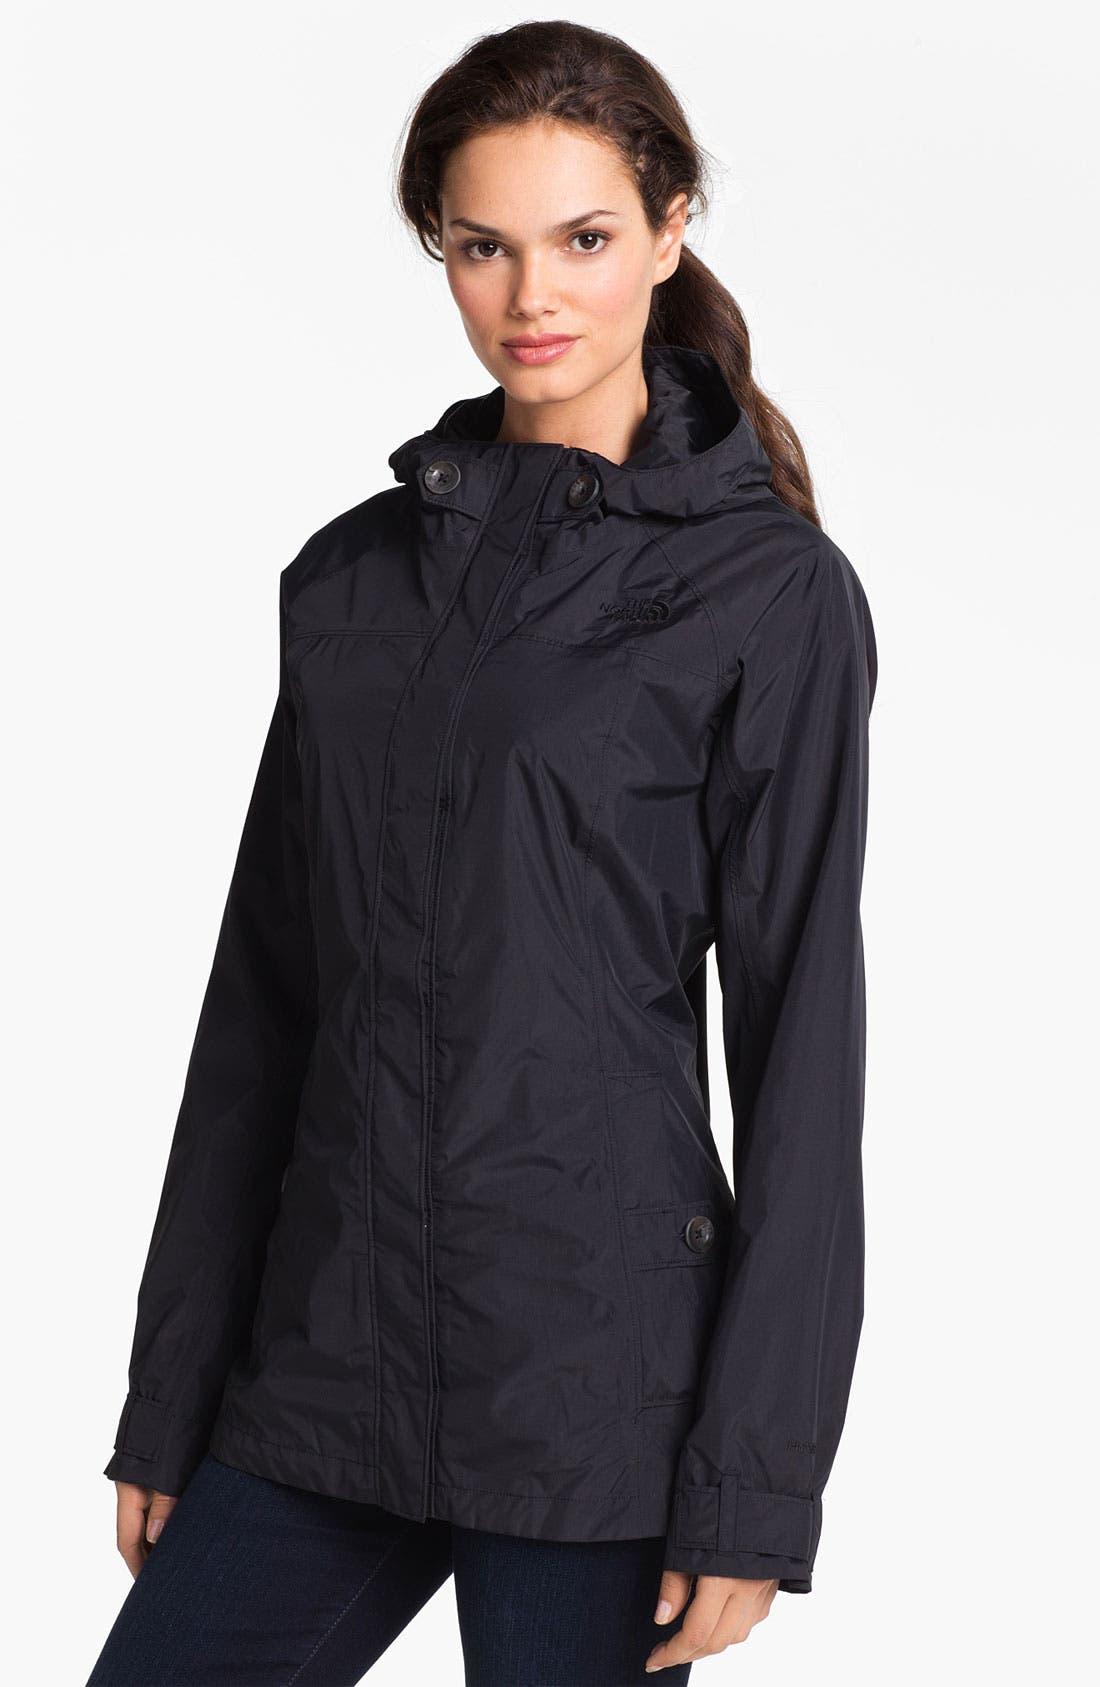 Alternate Image 1 Selected - The North Face 'Carli' Rain Jacket